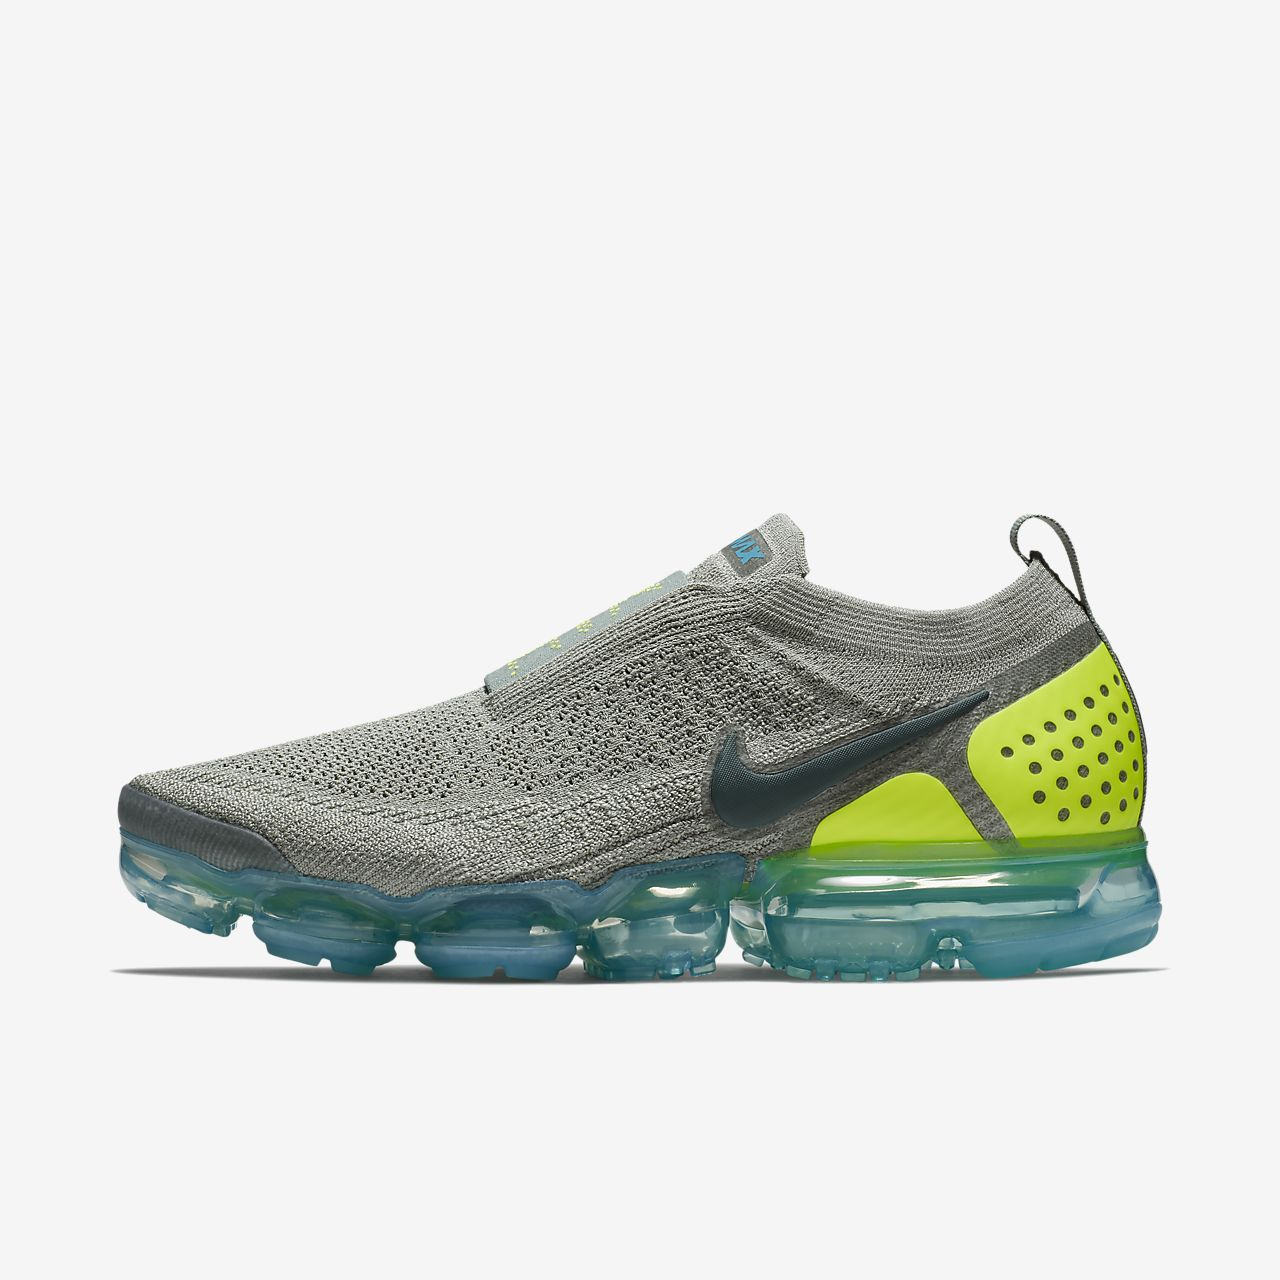 2d0d45d6ea525 Nike Air VaporMax Flyknit Moc 2 Shoe. Nike.com PT